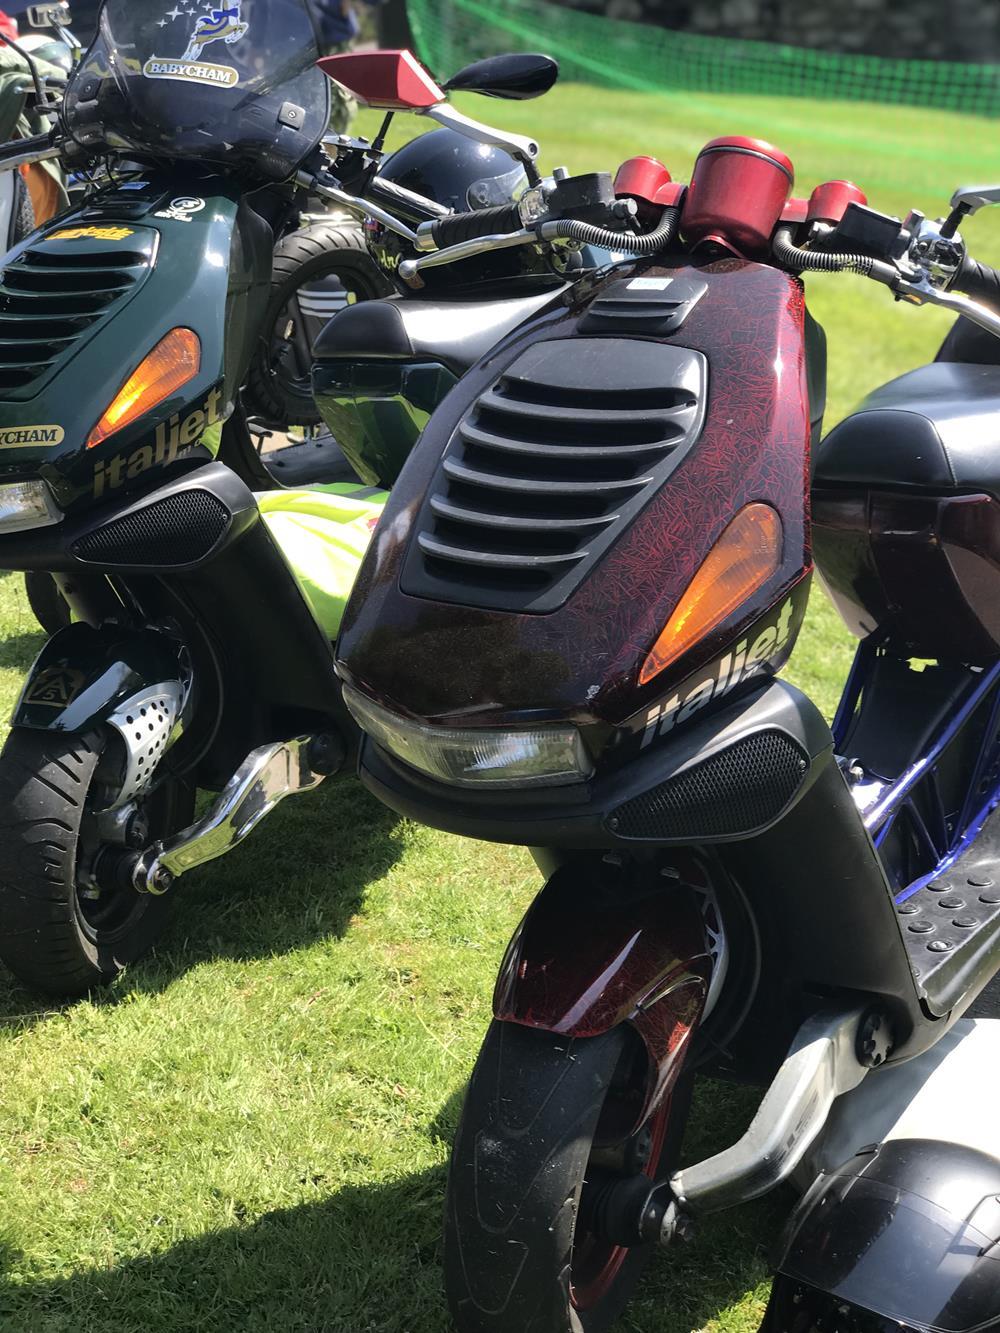 Dark red Italjet Dragster scooter